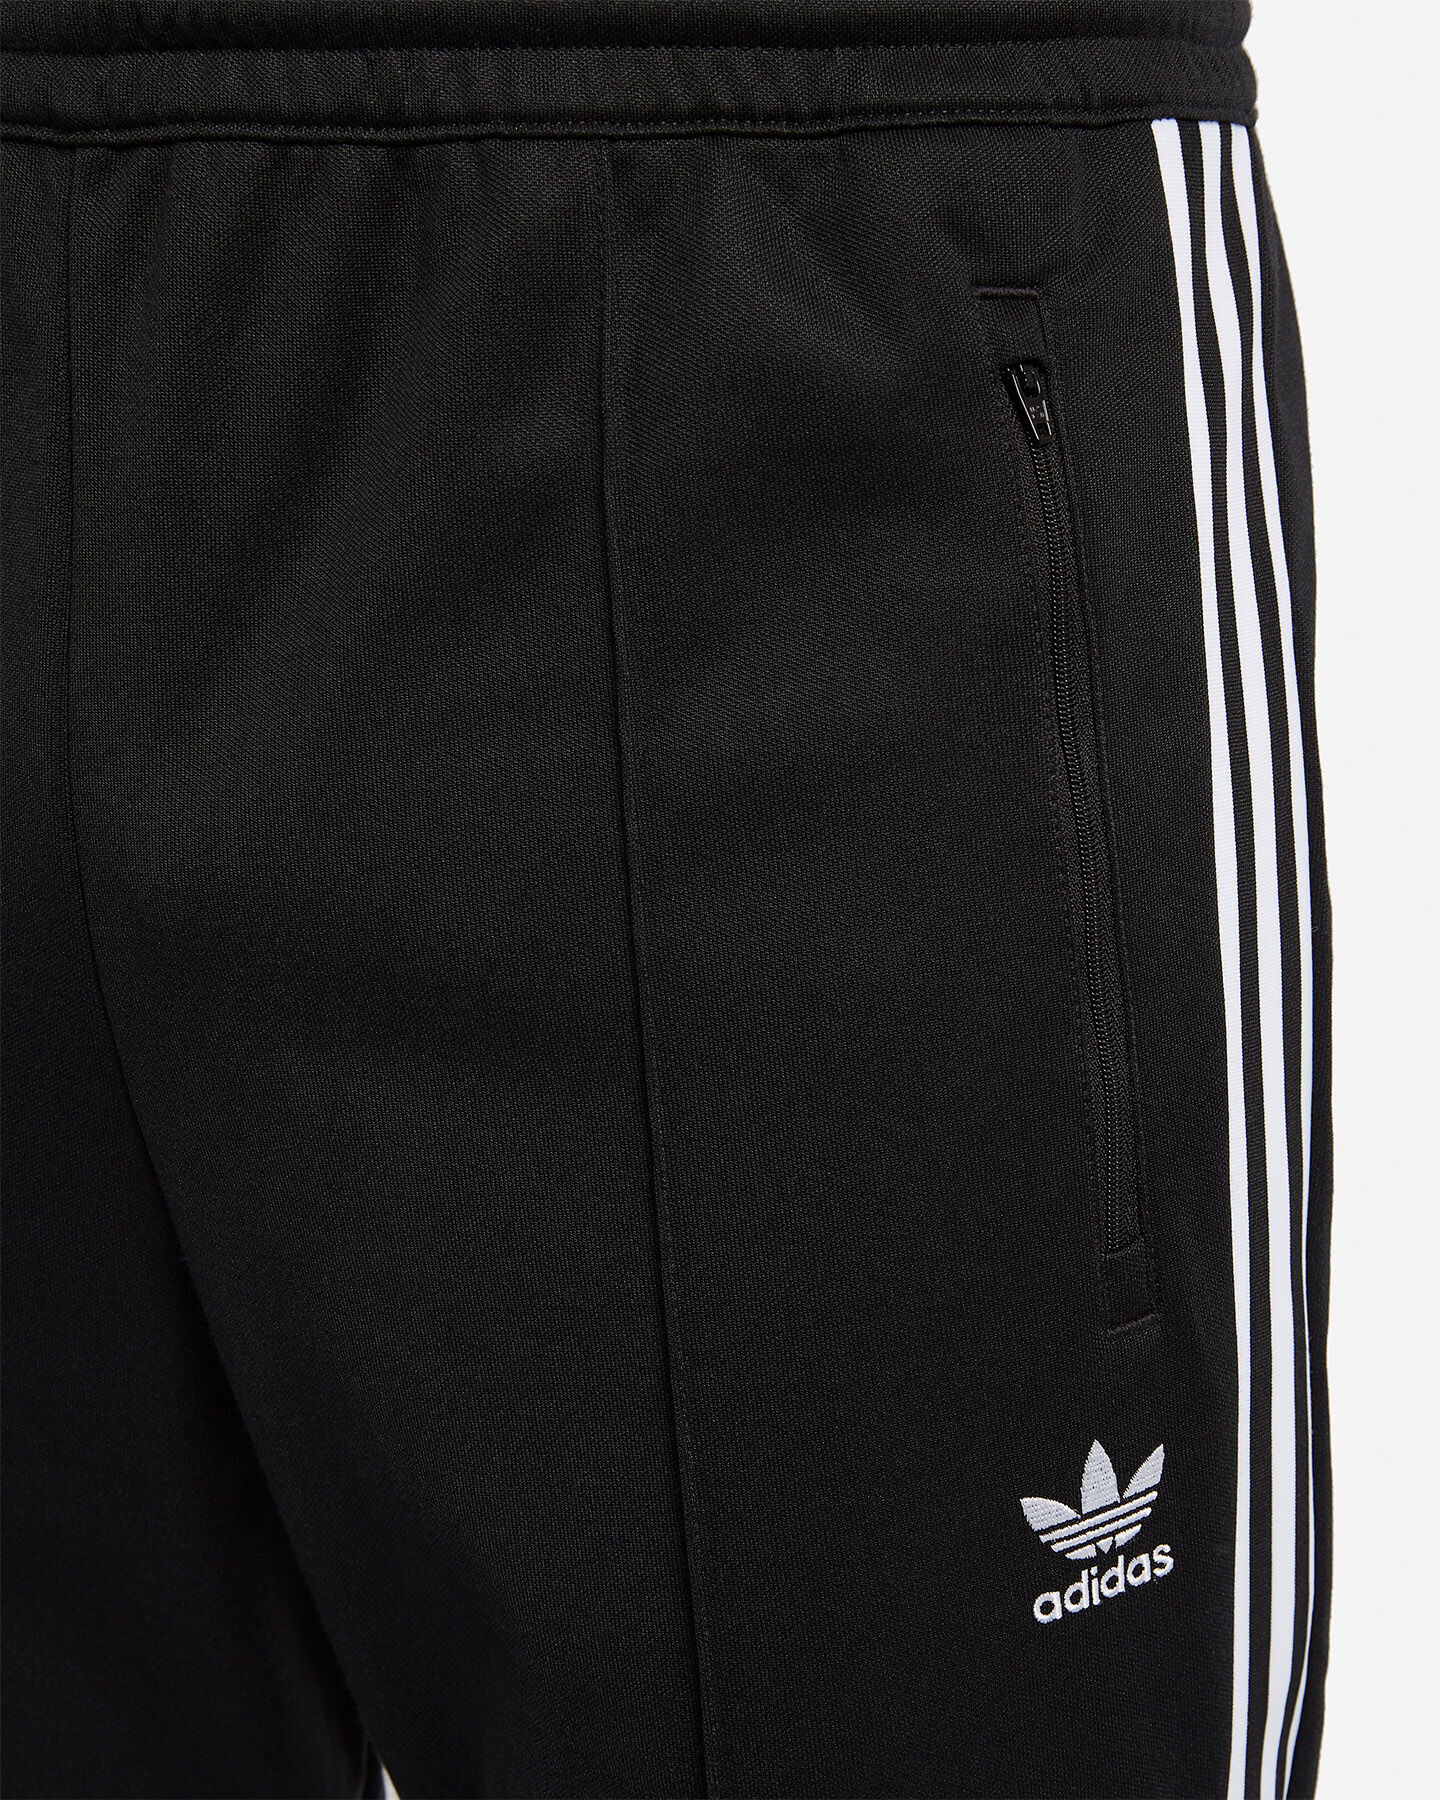 Pantalone ADIDAS FRANZ BECKENBAUER  M S4033219 scatto 3